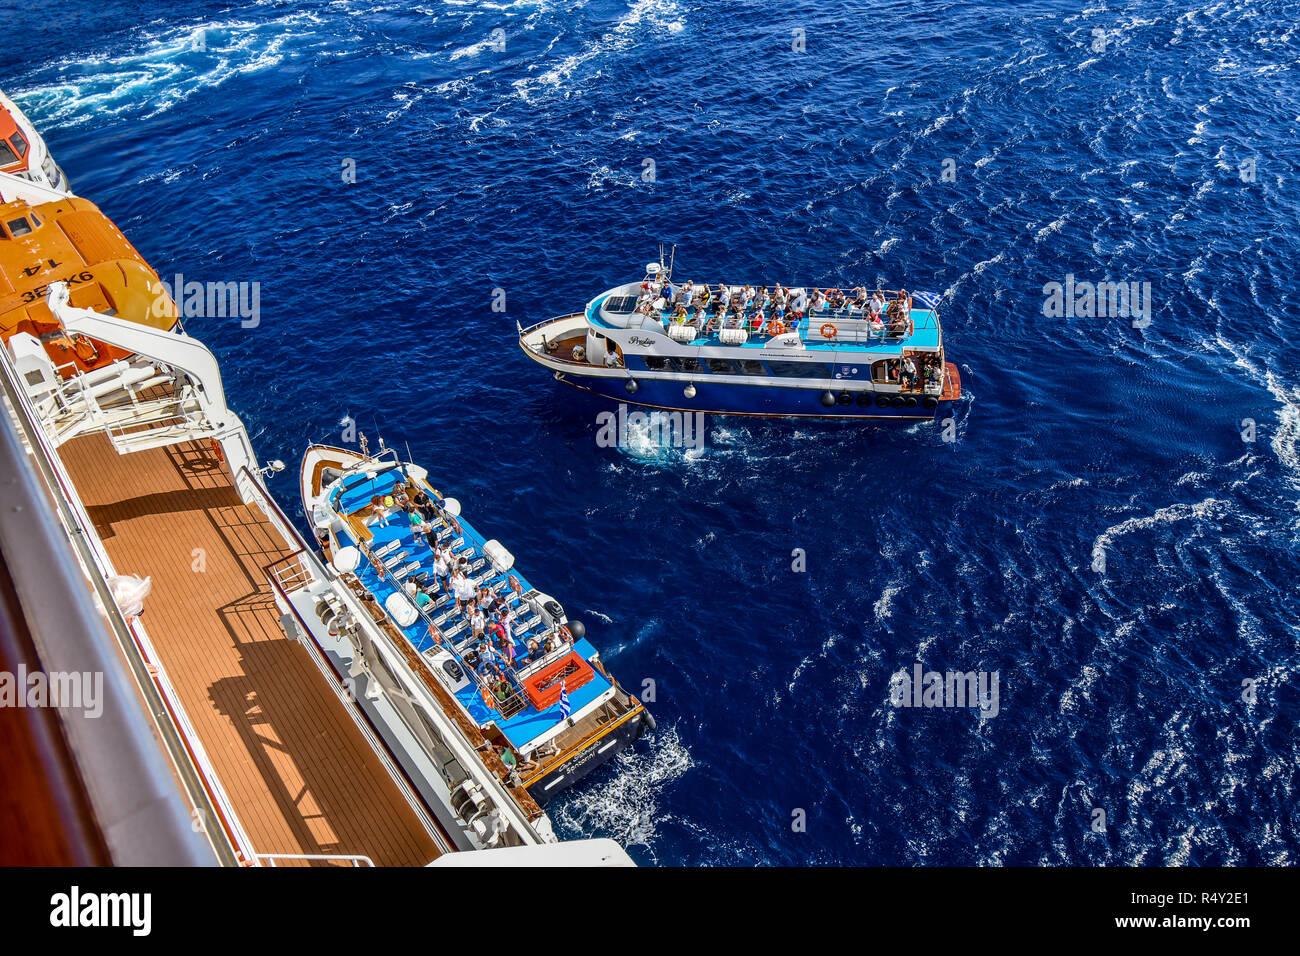 Tourists return to a cruise ship on transport tender boats inside the Santorini island caldera on the Aegean Sea. - Stock Image